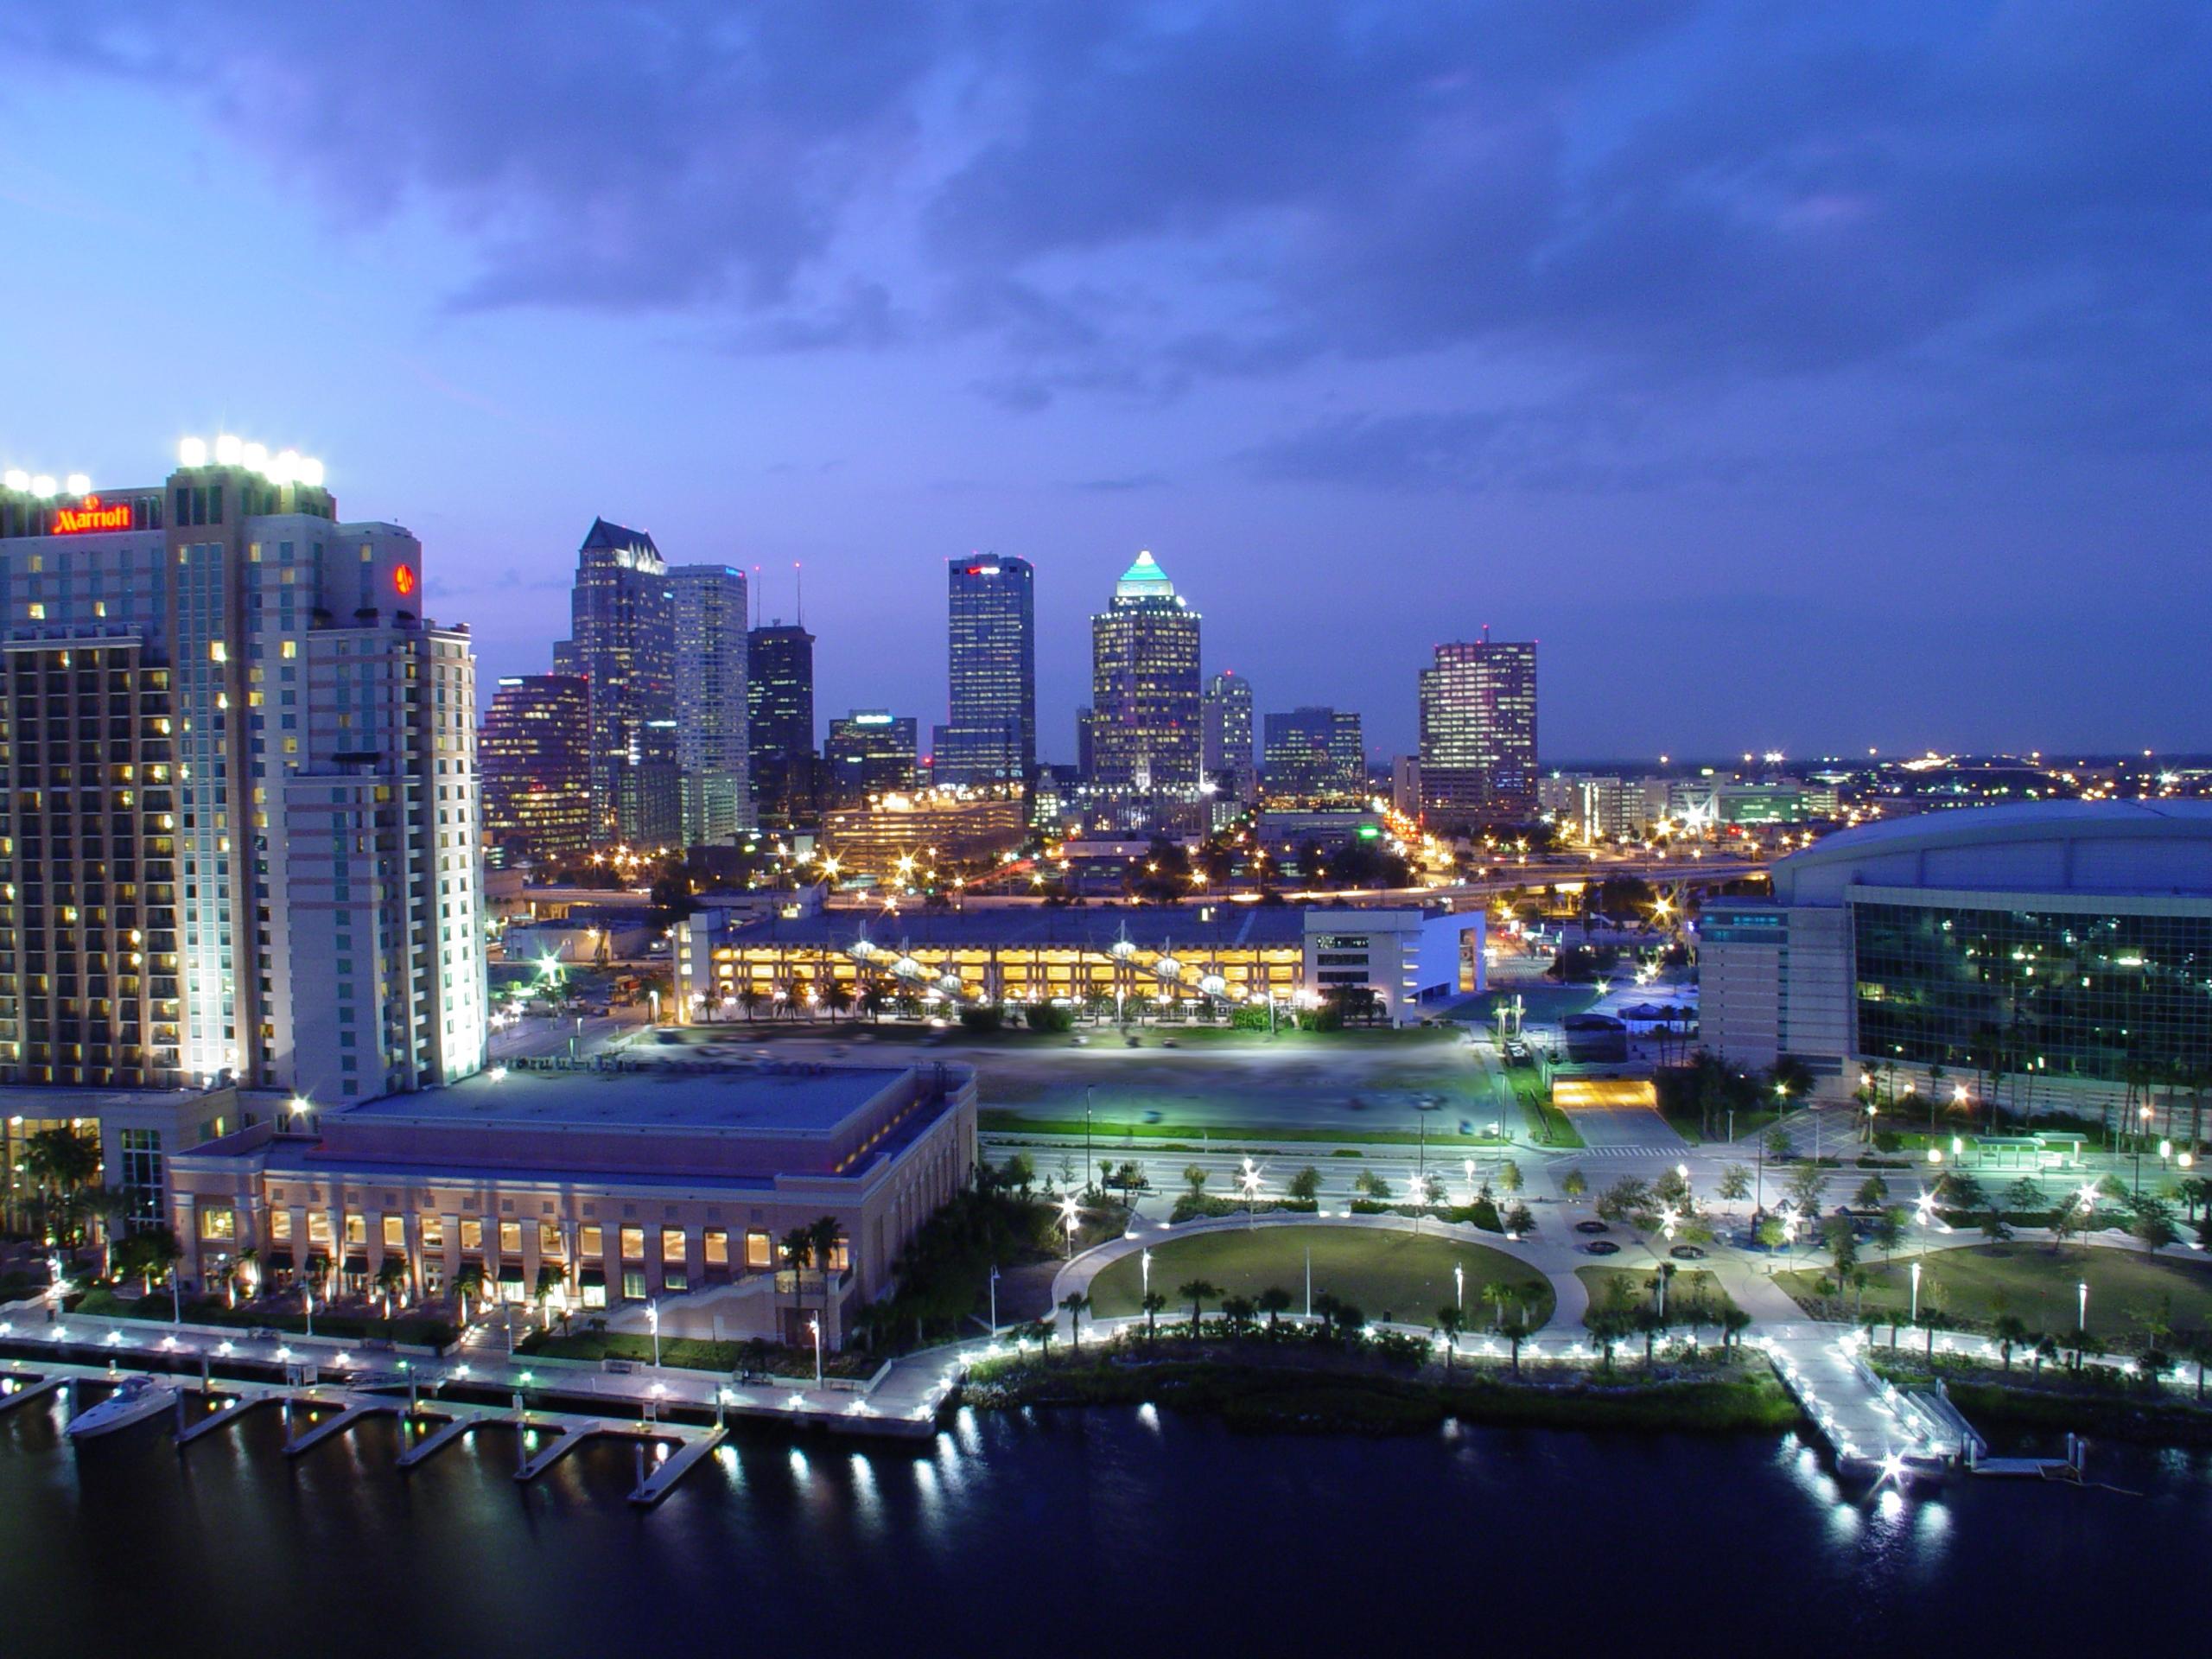 Tutors is proud to offer tutoring throughout Tampa Florida 2560x1920